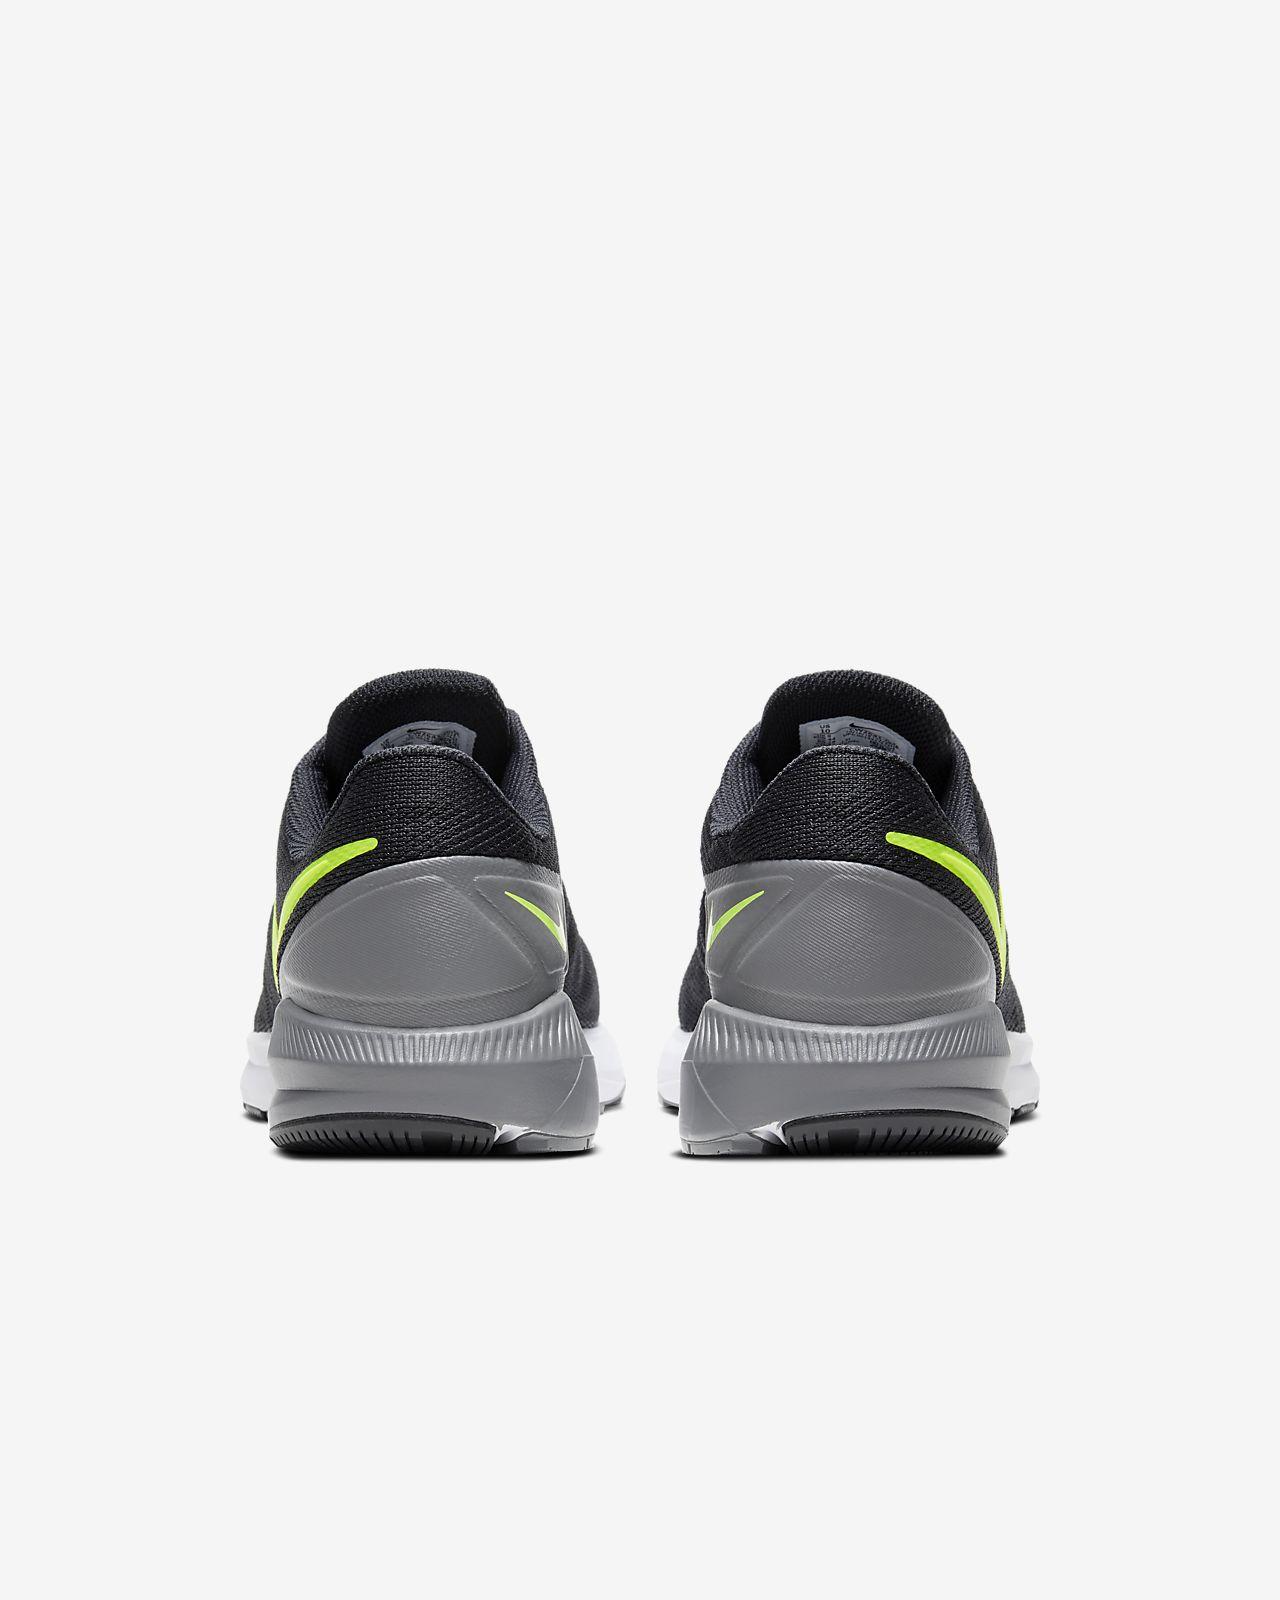 Scarpa da running Nike Air Zoom Structure 22 Uomo